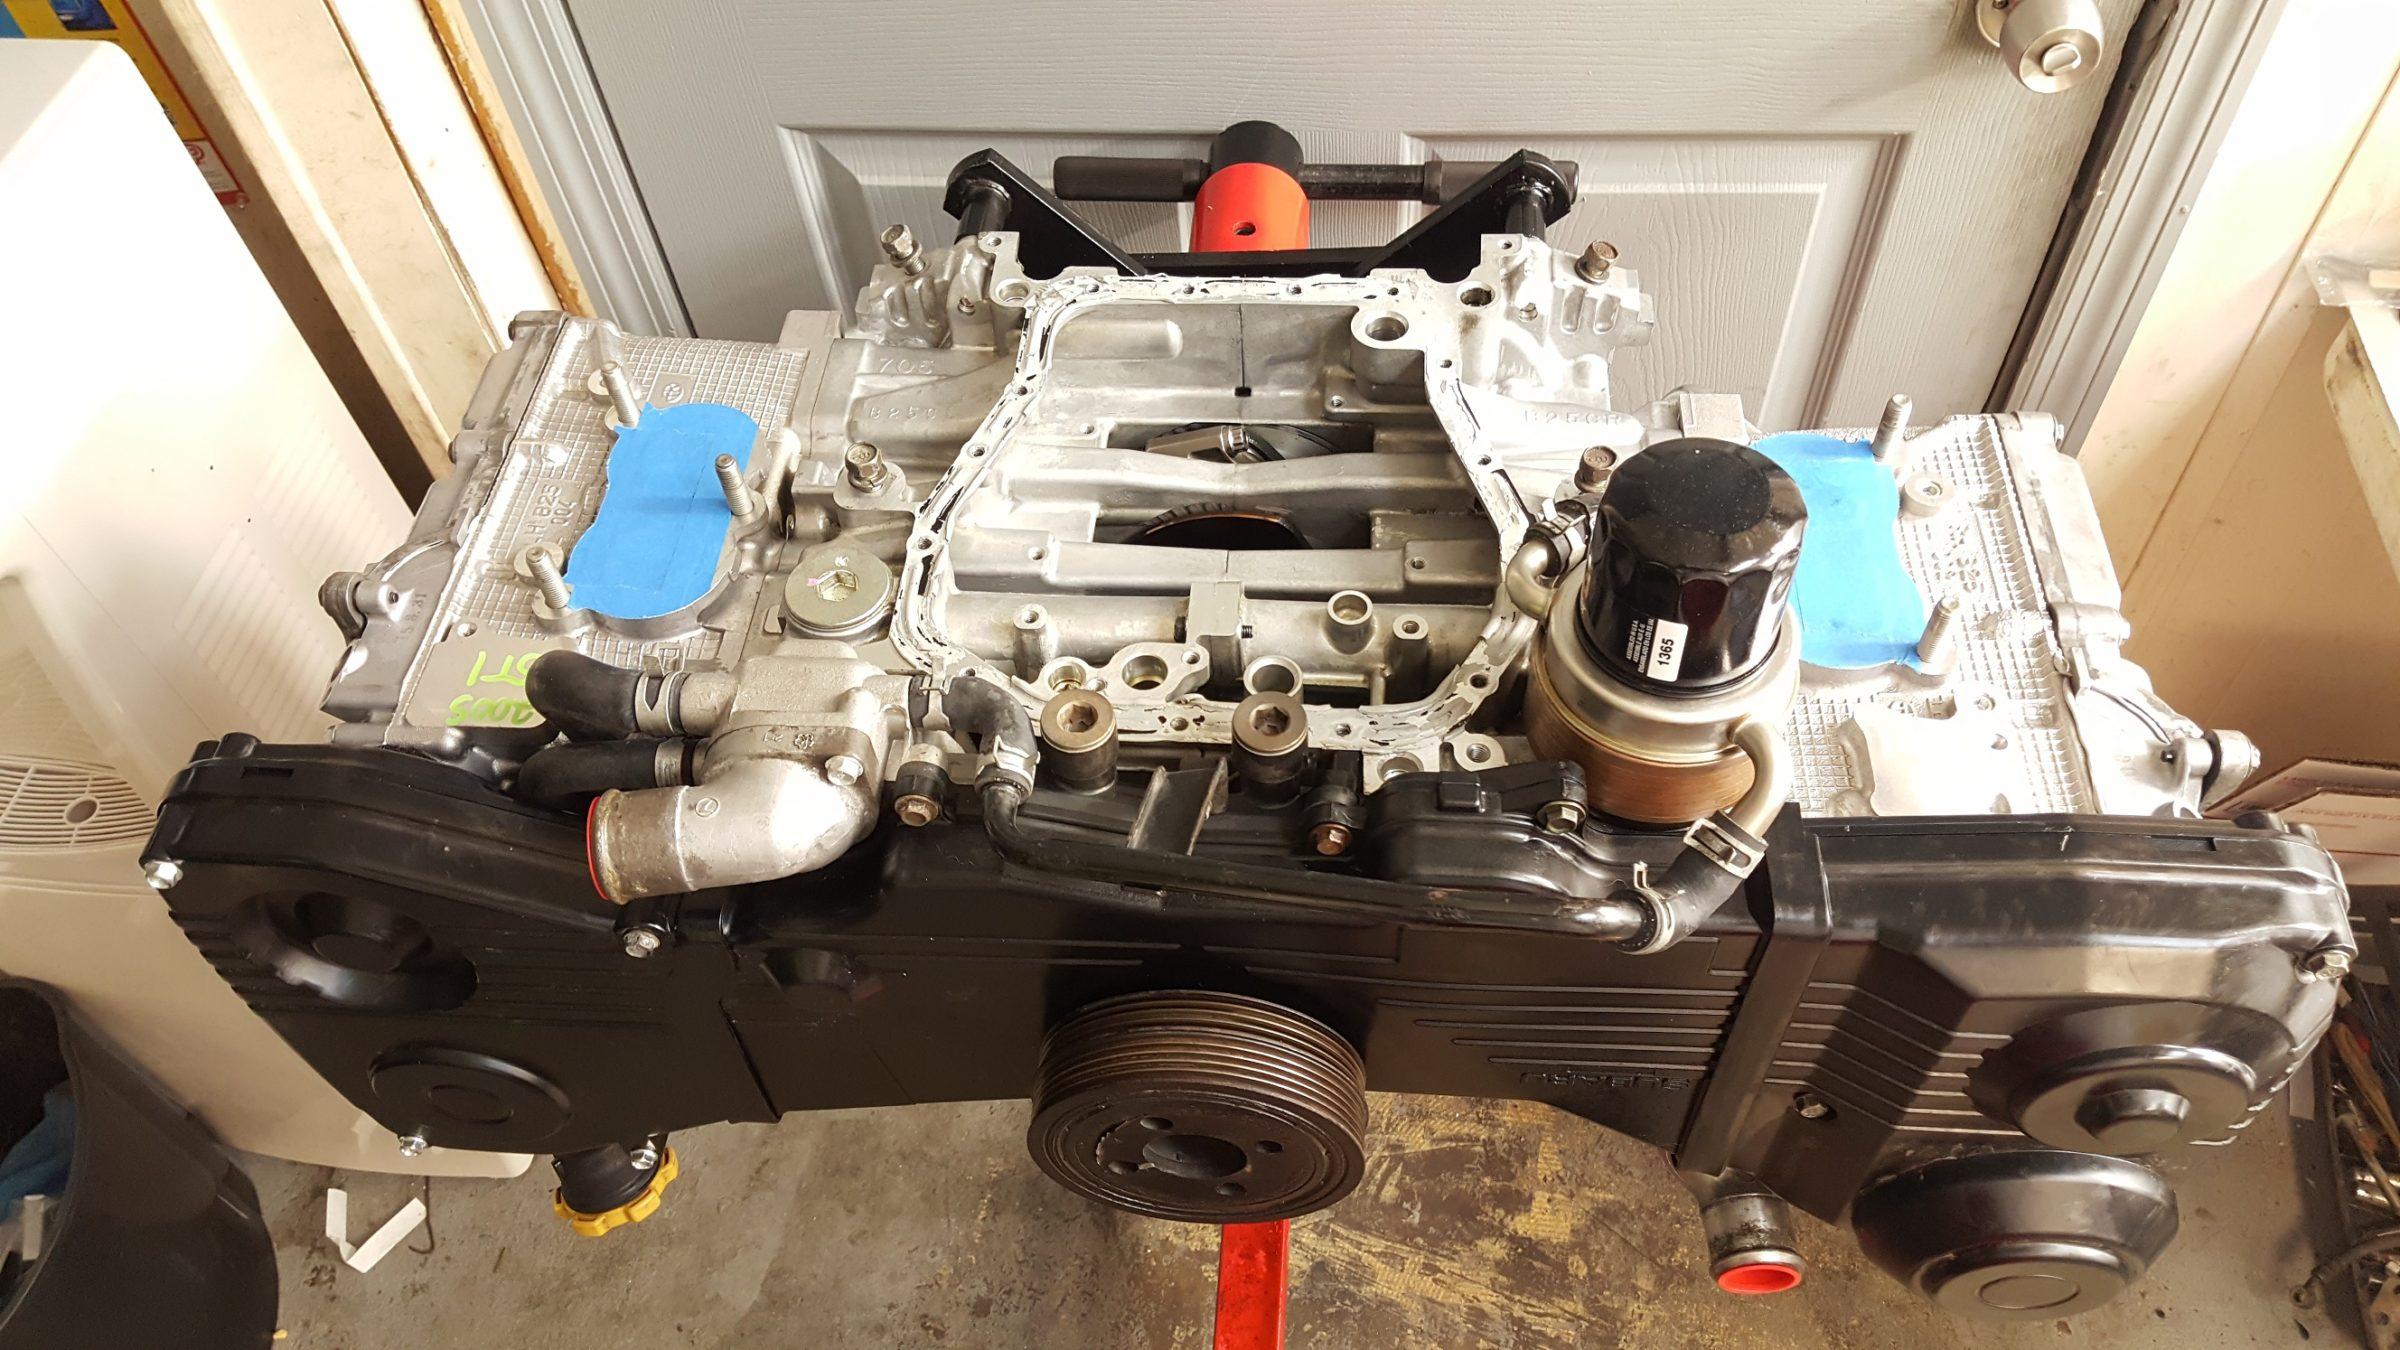 06-14 SUBARU WRX / 04-07 STI / 04-08 FXT/LGT RALLISPEC BUILT LONG BLOCK  ENGINE (FORGED INTERNALS) W/ 1K MILES